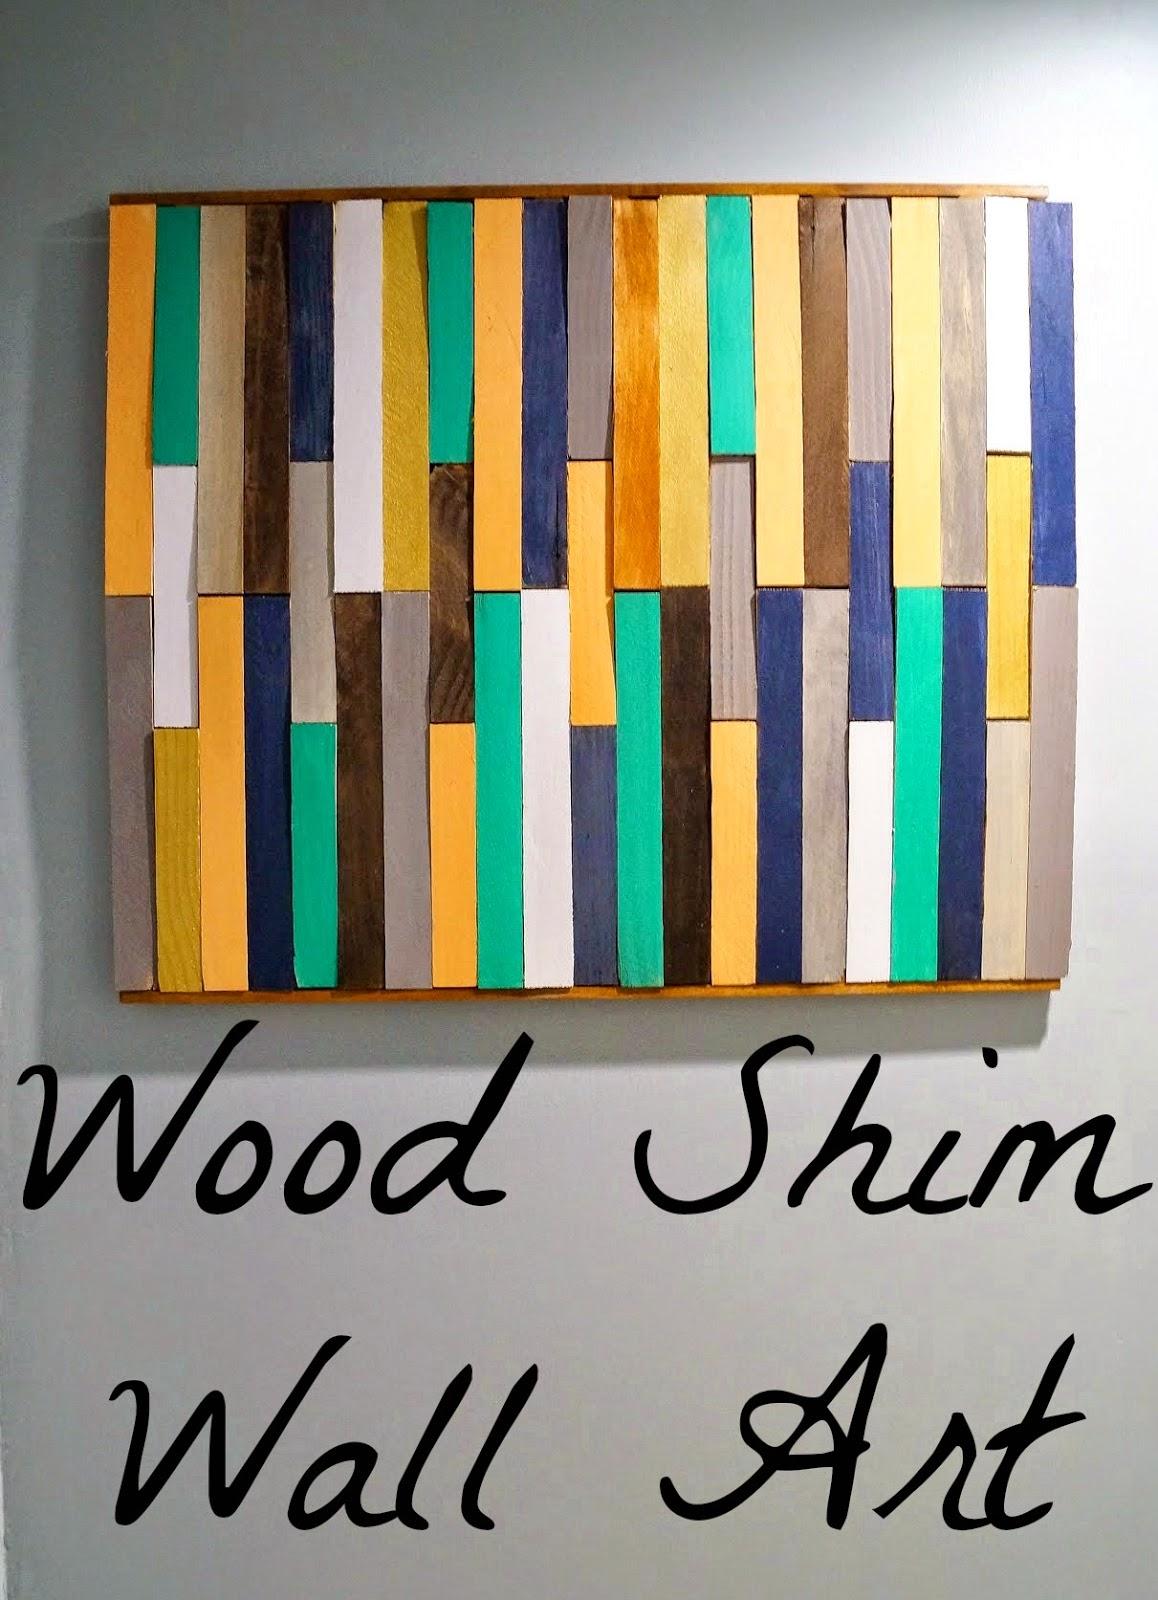 Wood Shim Wall Art